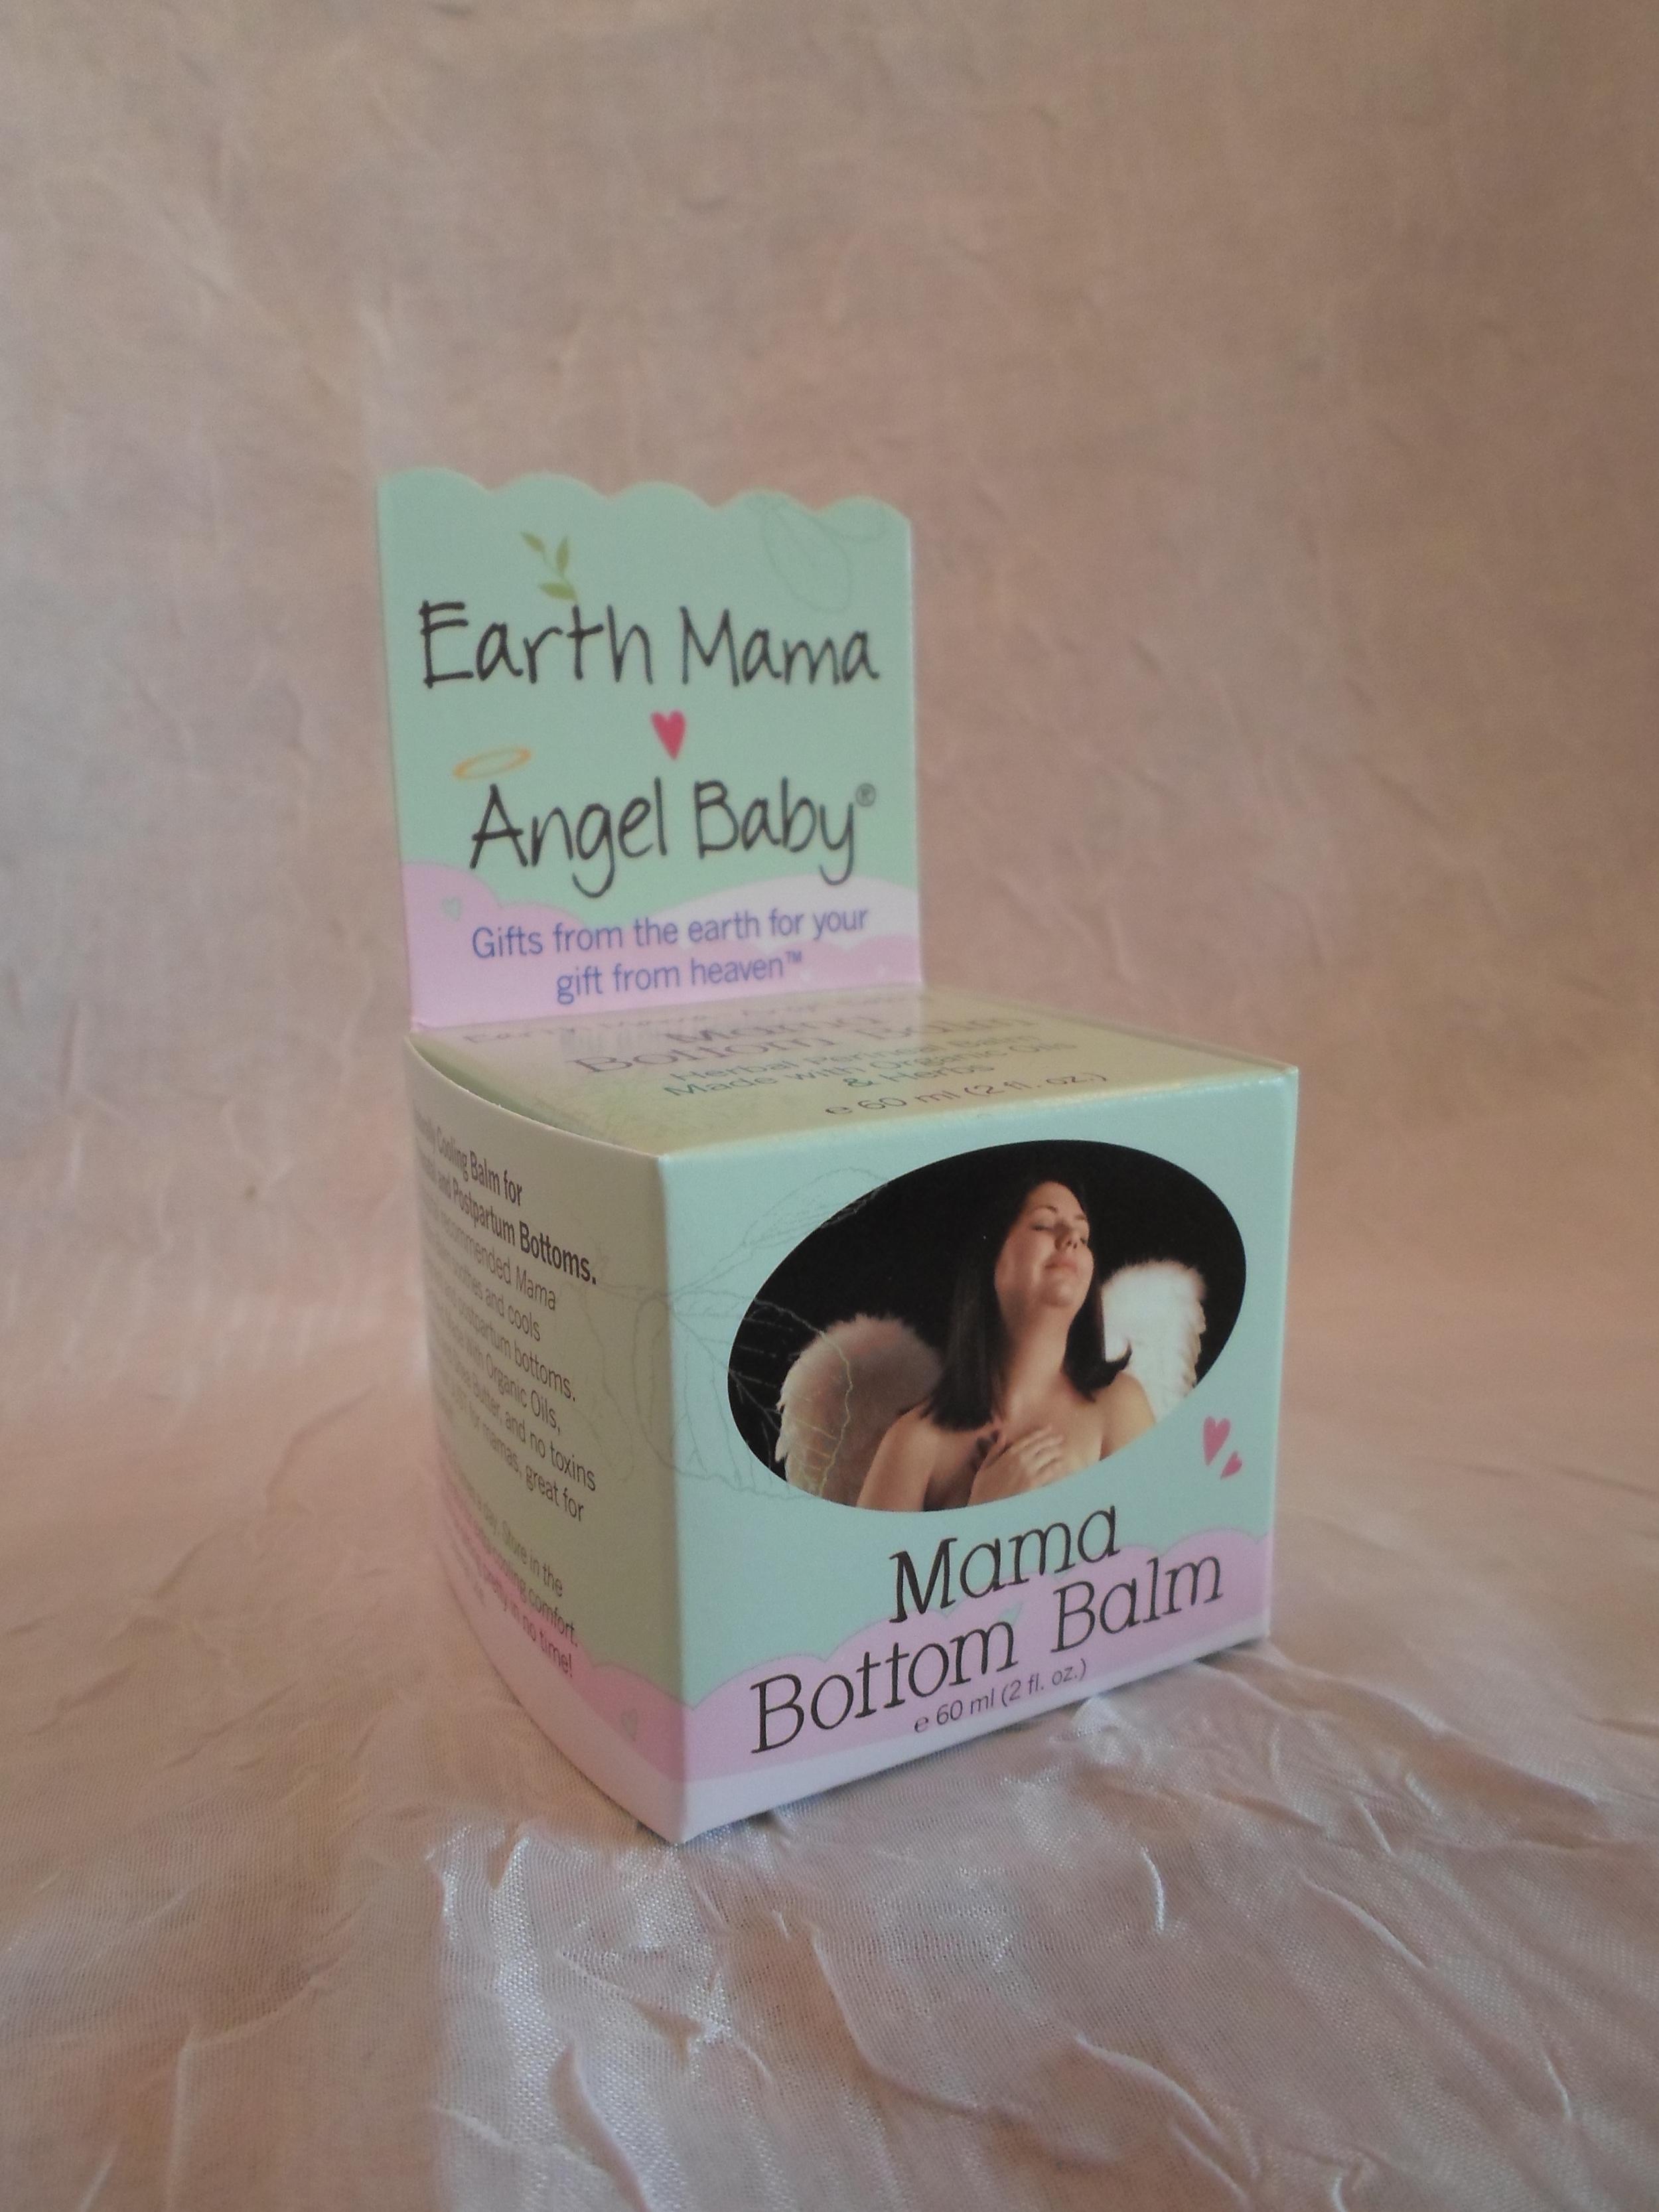 Earth Mama Angel Baby Bottom Balm   for Mama    $15.95    Wants 1 PURCHASED